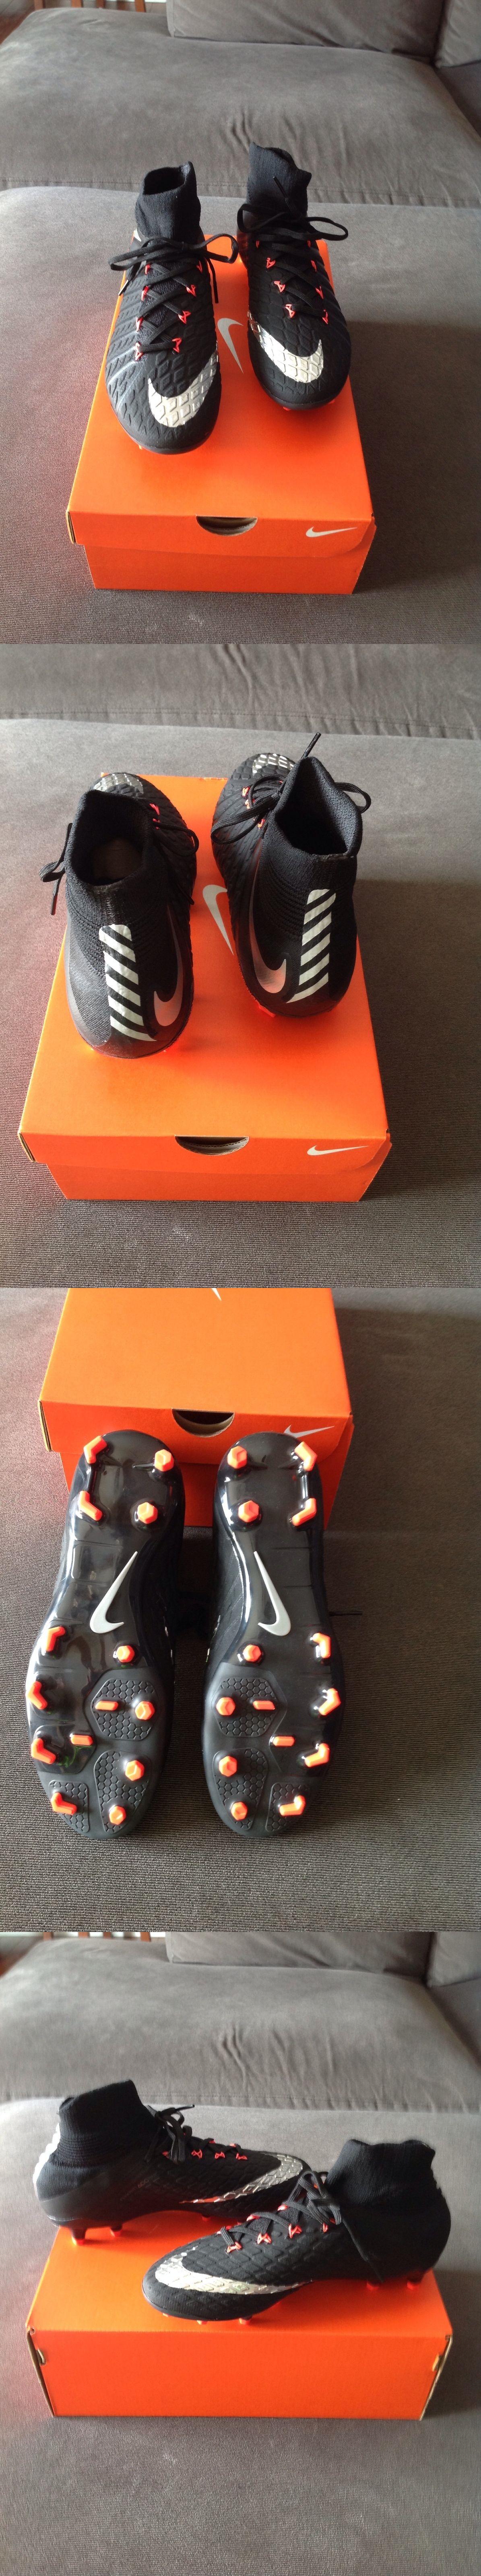 Women 159176: Nike Jr. Flyknit Hypervenom Phantom 3 Df Fg Soccer Cleats  Youth Women